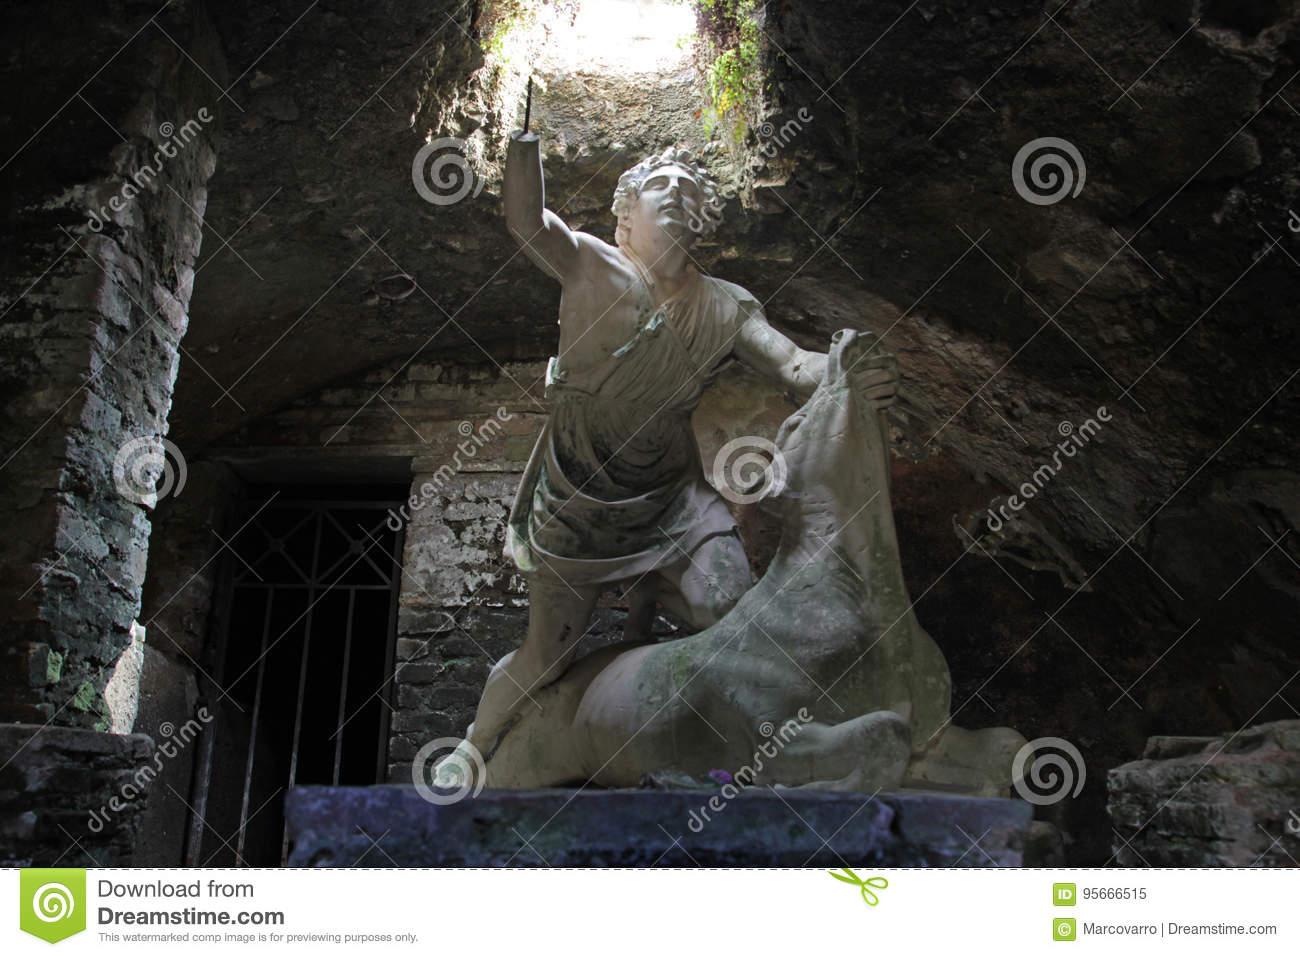 mithra-god-statue-ostia-antca-italy-july-underground-temple-osta-antica-ancient-roman-town-95666515[1]